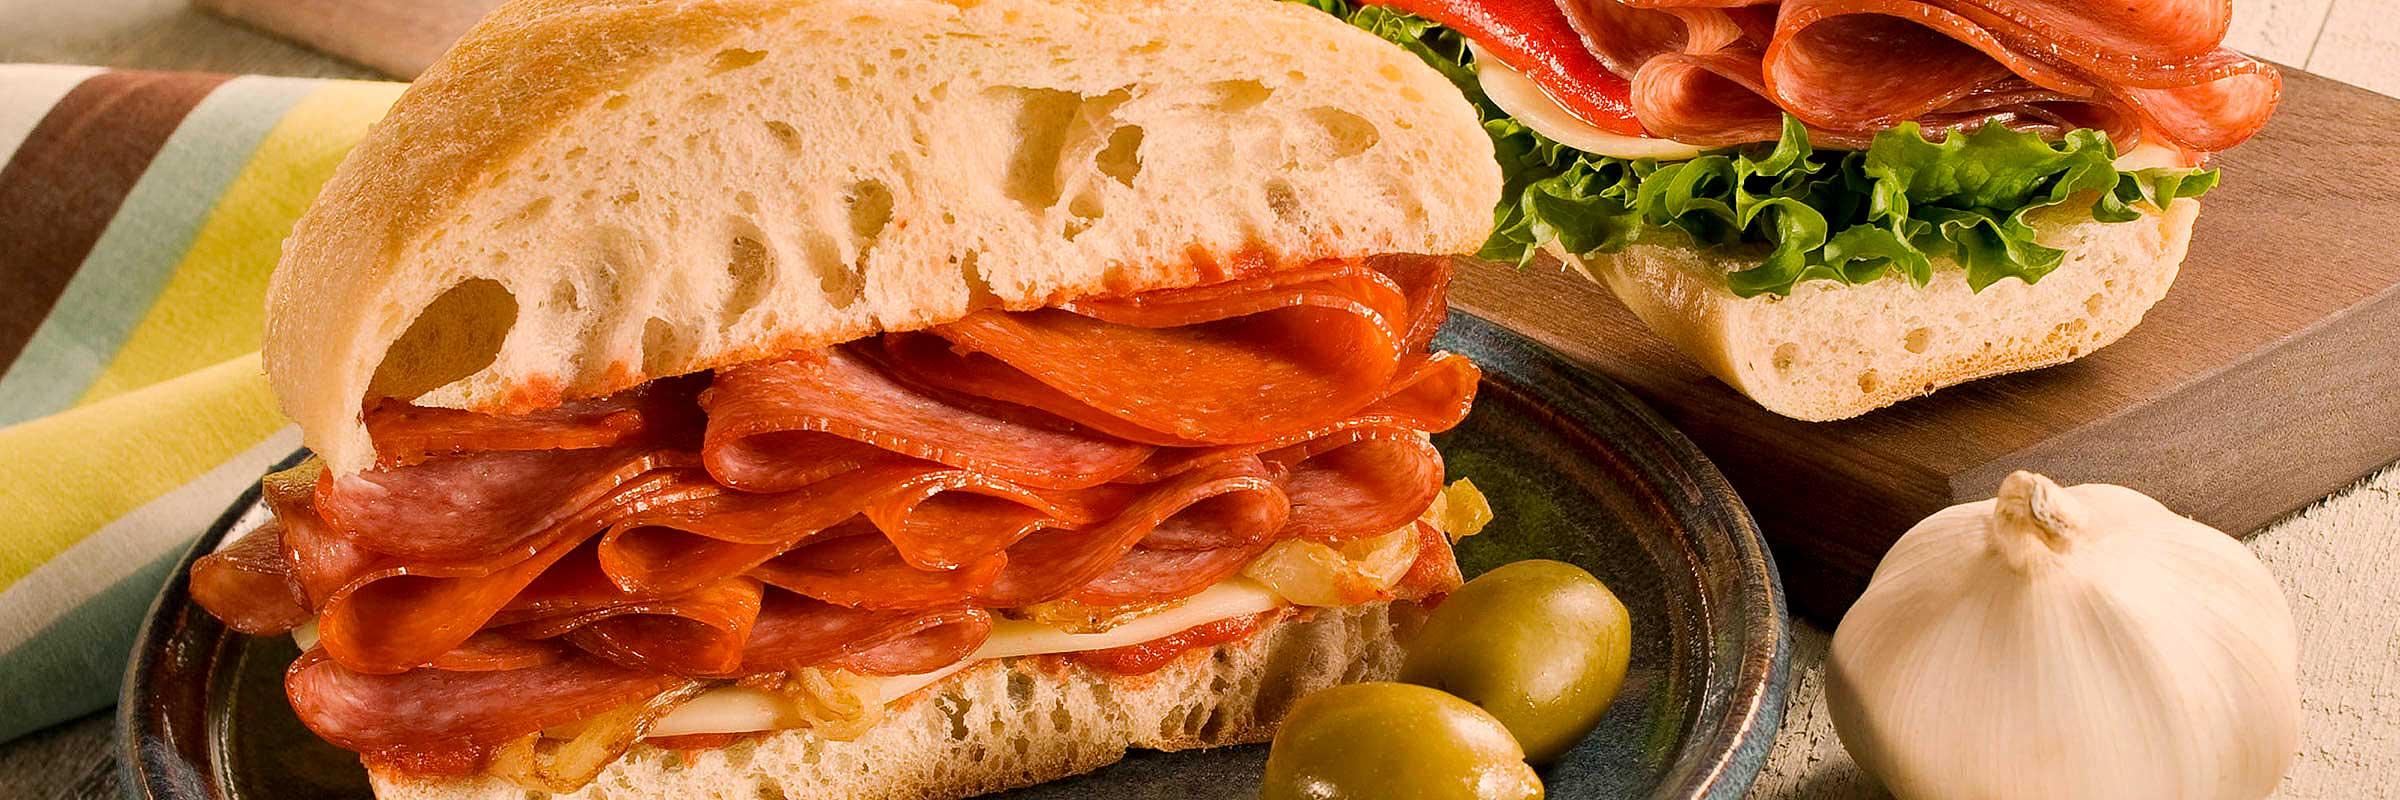 Deli Meats Sticks Amp Links Liguria Foods